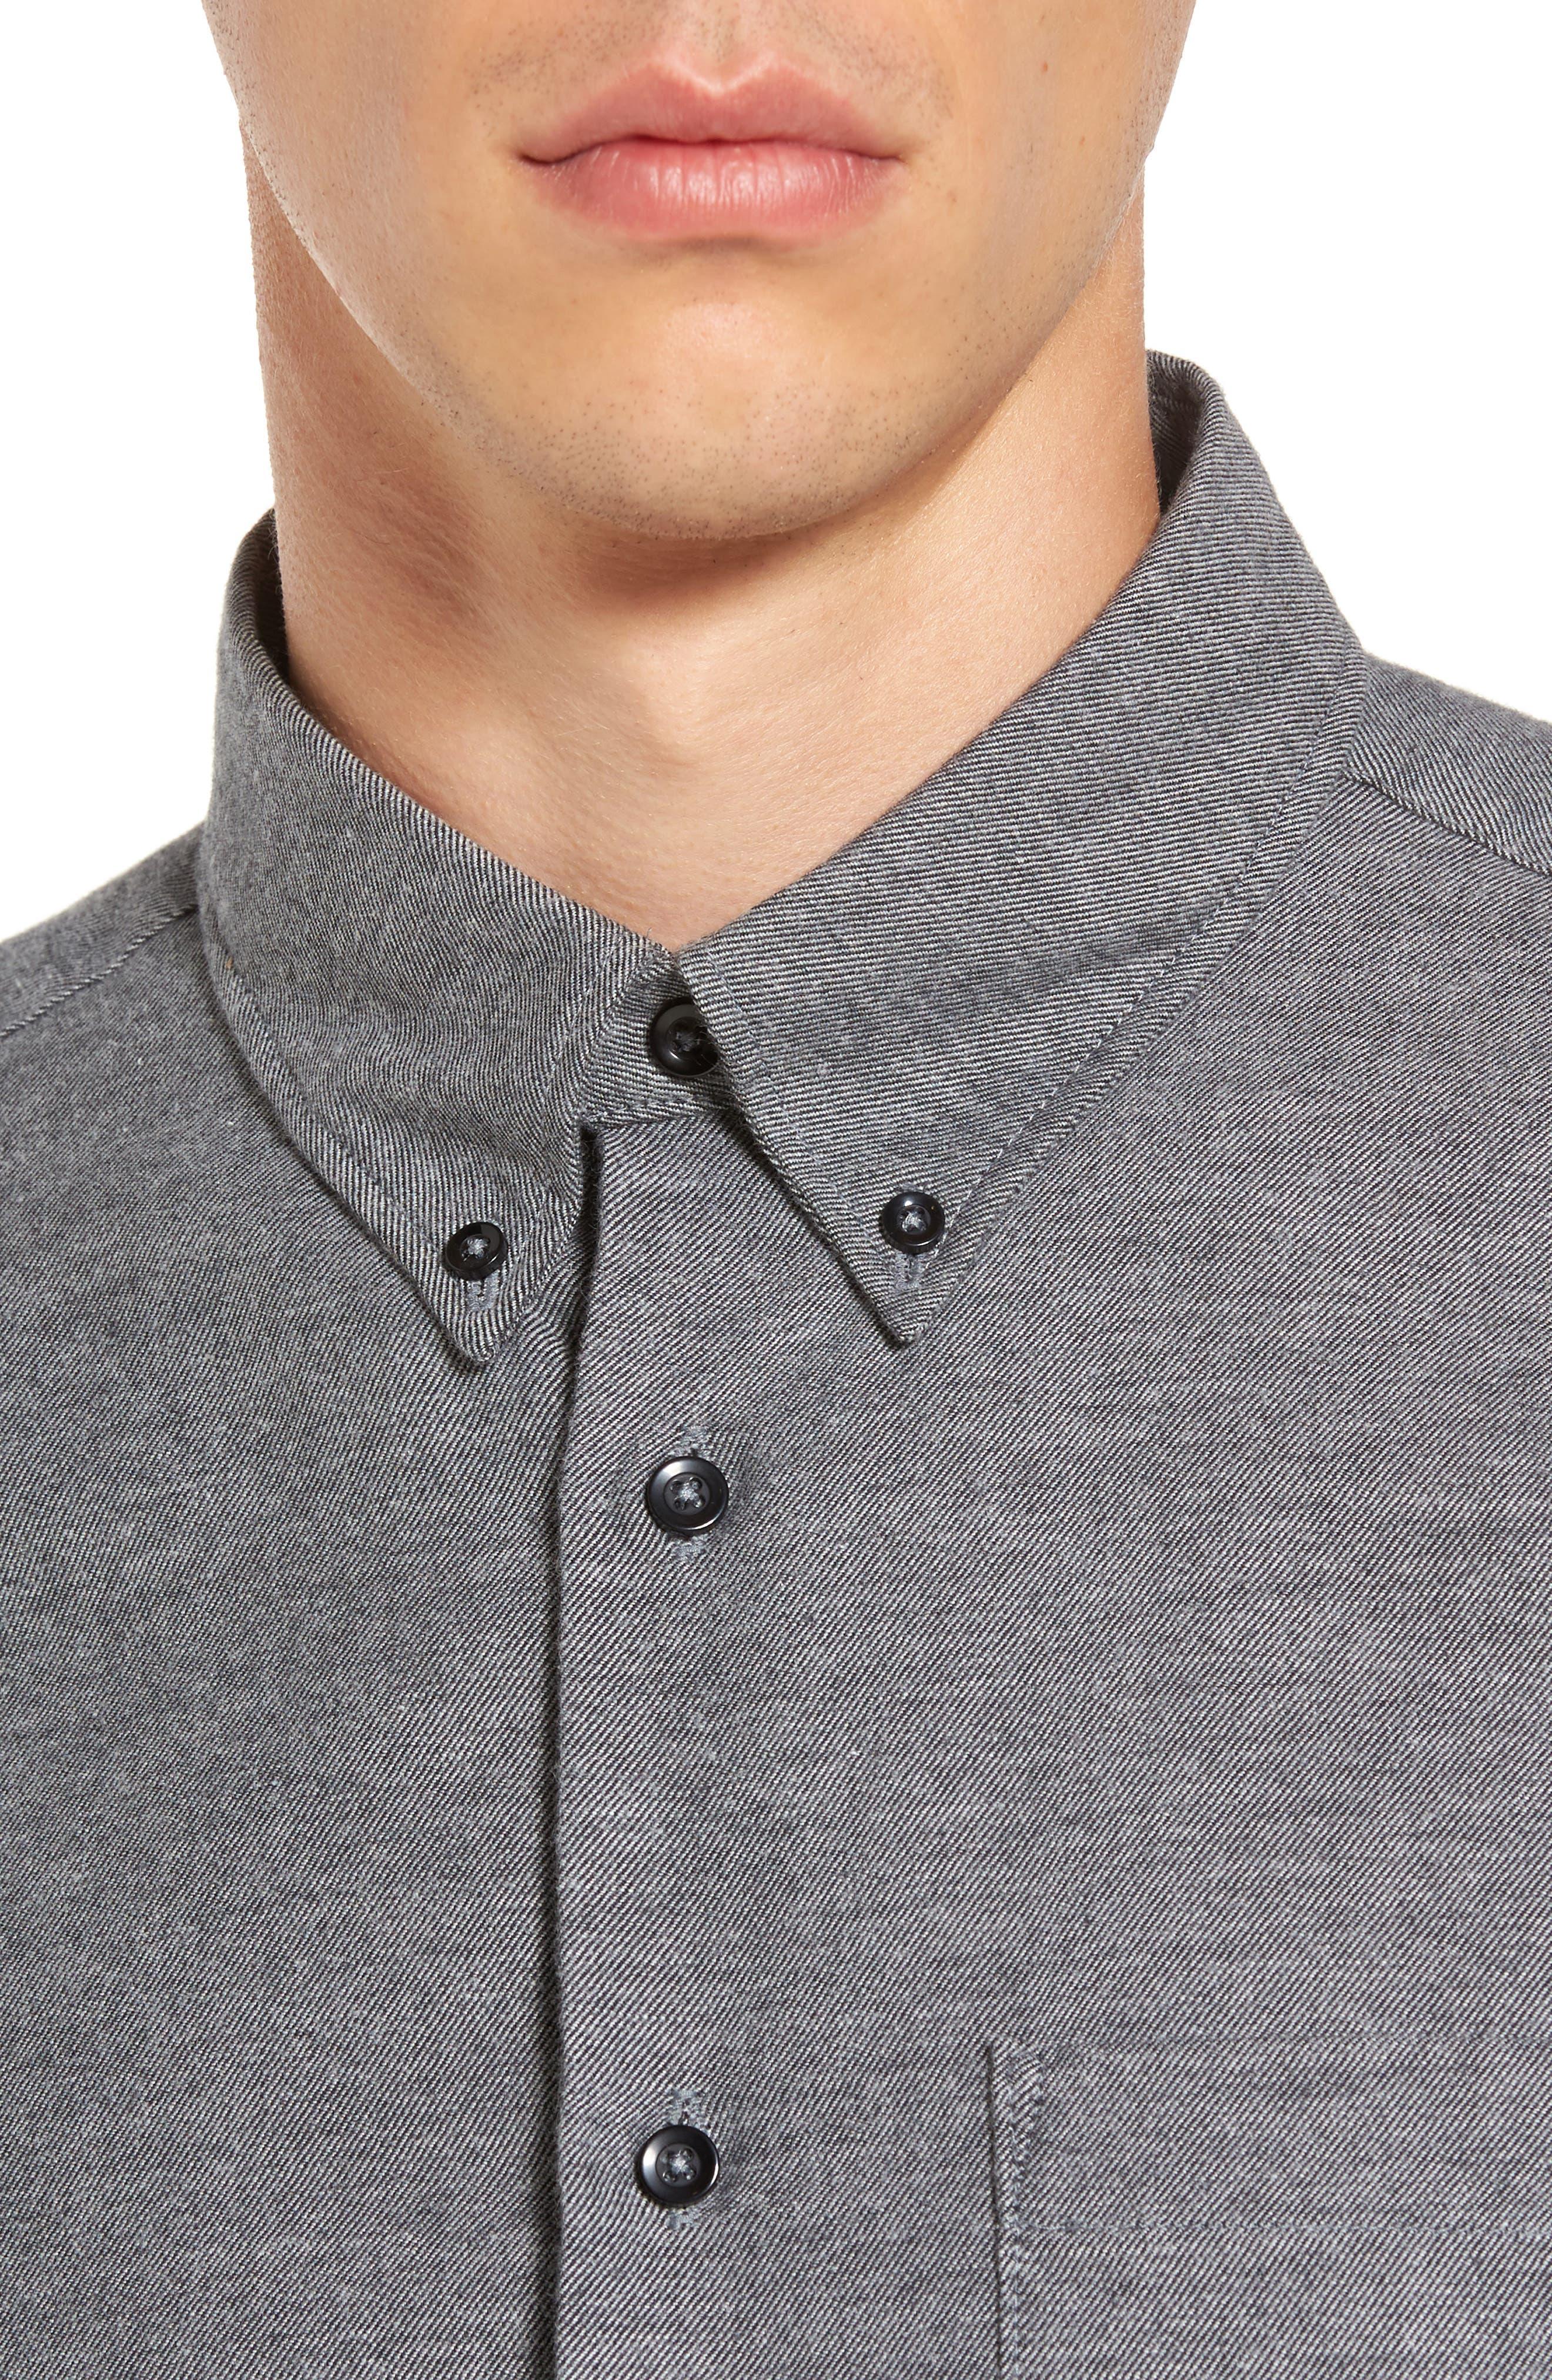 Twill Woven Shirt,                             Alternate thumbnail 4, color,                             030